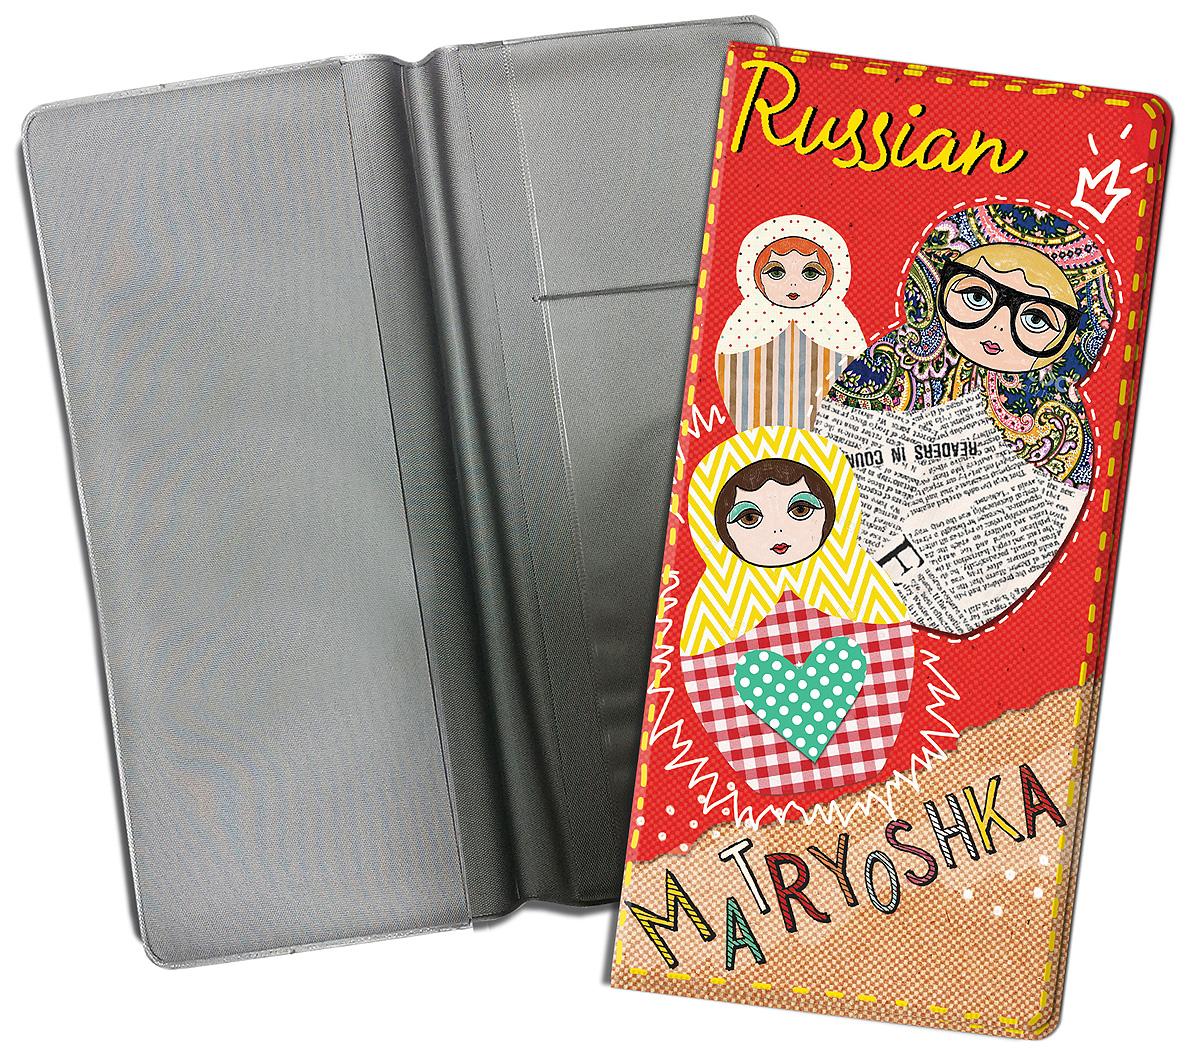 Конверт путешественника Magic Home Матрешки на красном, для документов. 77117 сувенир конверт путешественника авто винтаж для документов из пвх 20 5 22см 77224